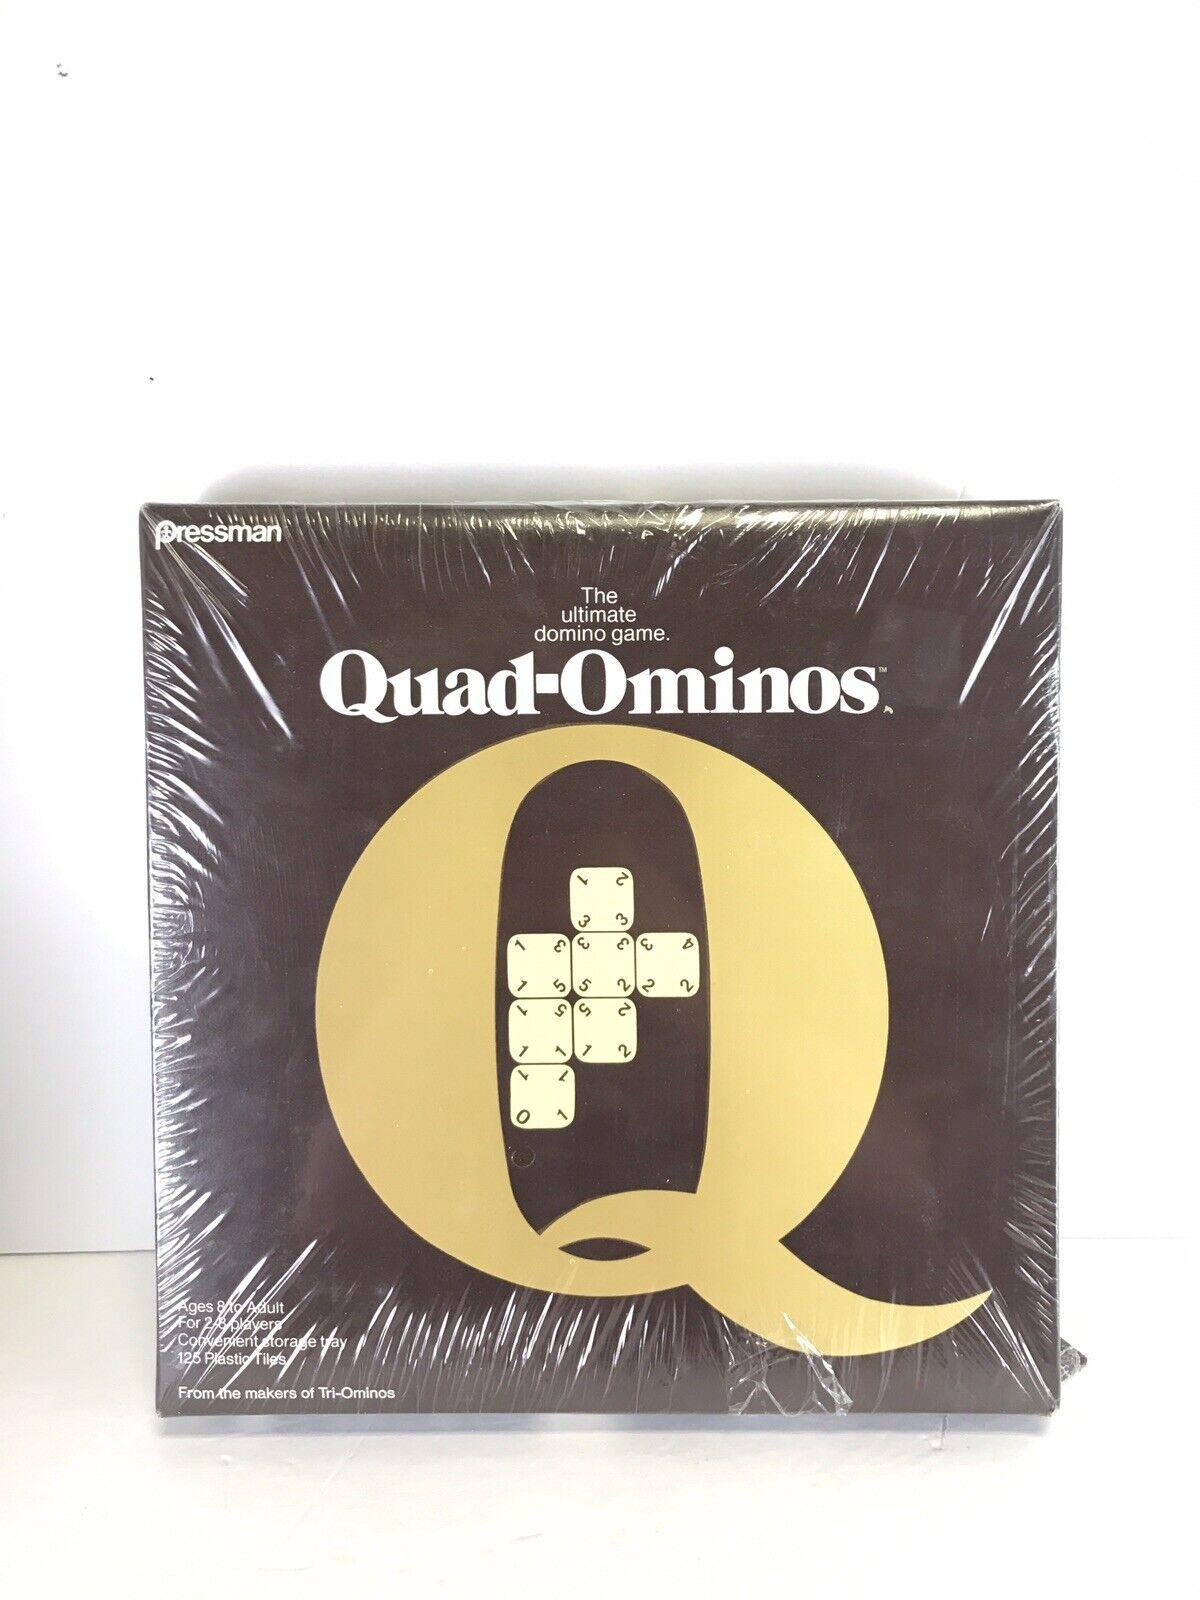 QUAD-OMINOS Ultimate Domino TILE BOARD GAME Pressman 1978 Quadominoes NEW